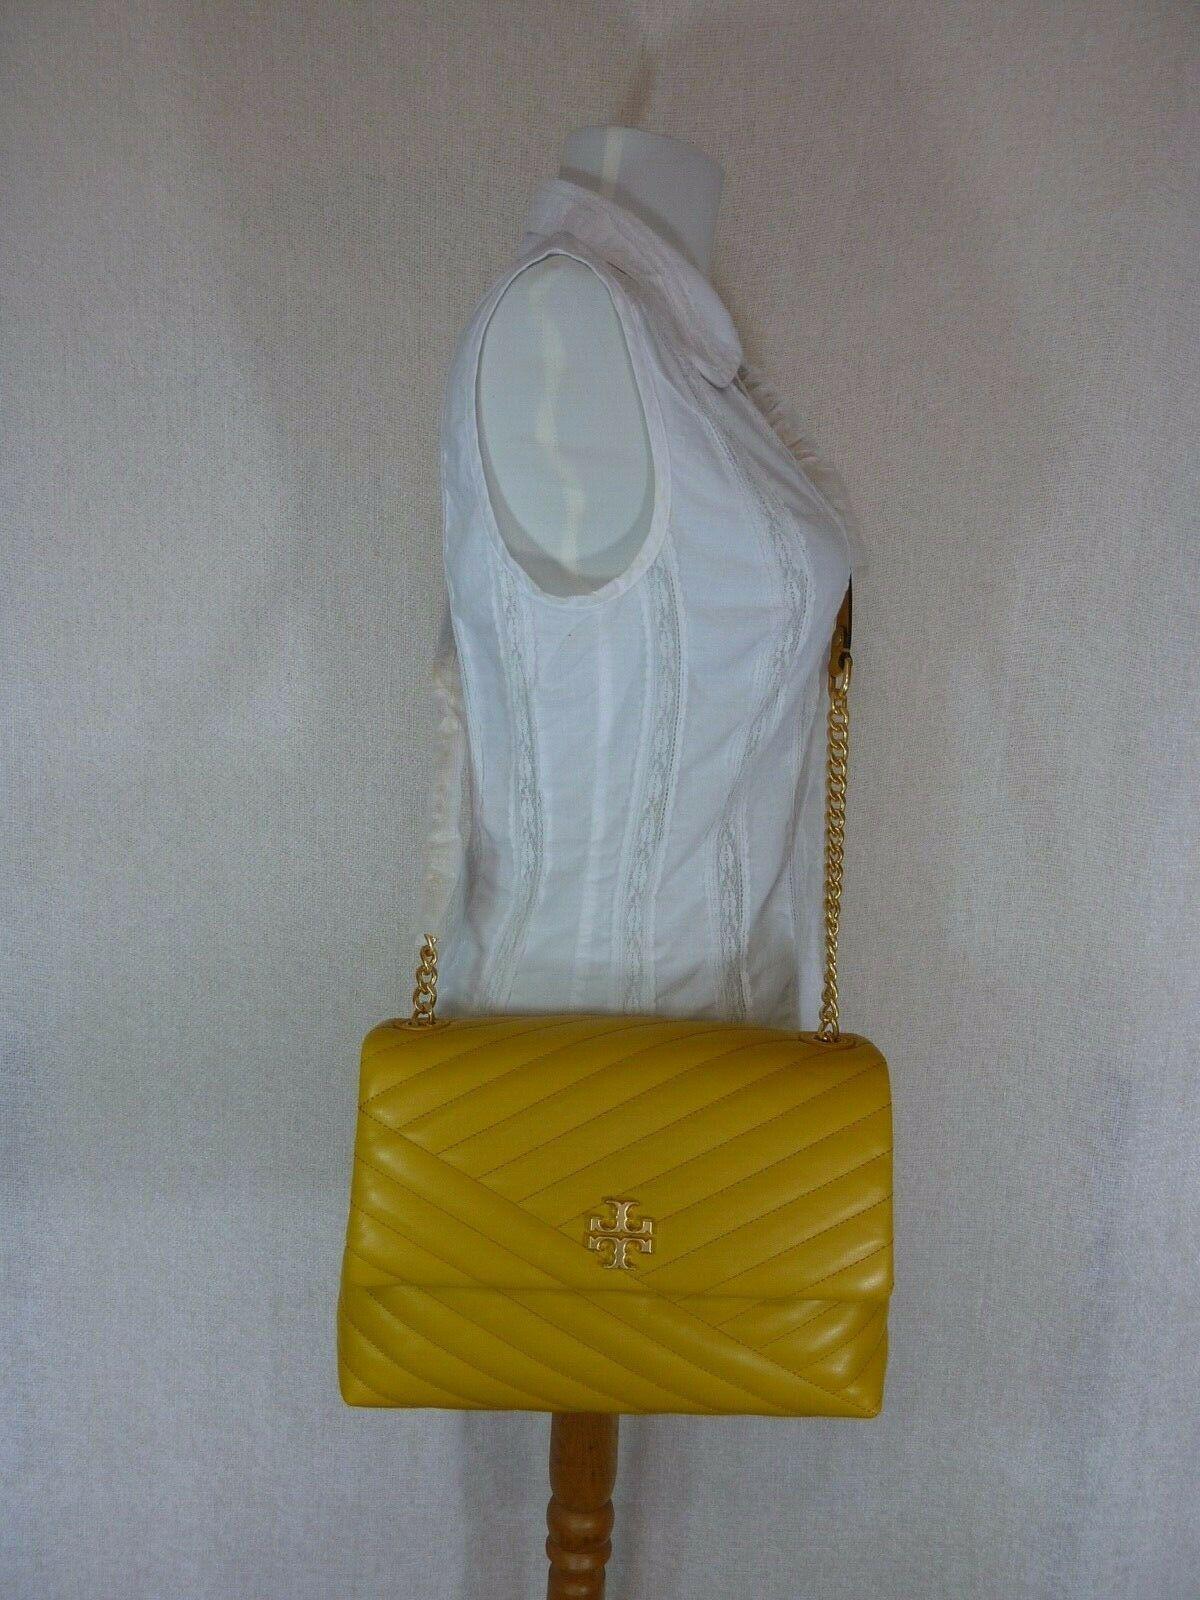 NWT Tory Burch Daylily Kira Chevron Flap Shoulder Bag $528 image 10